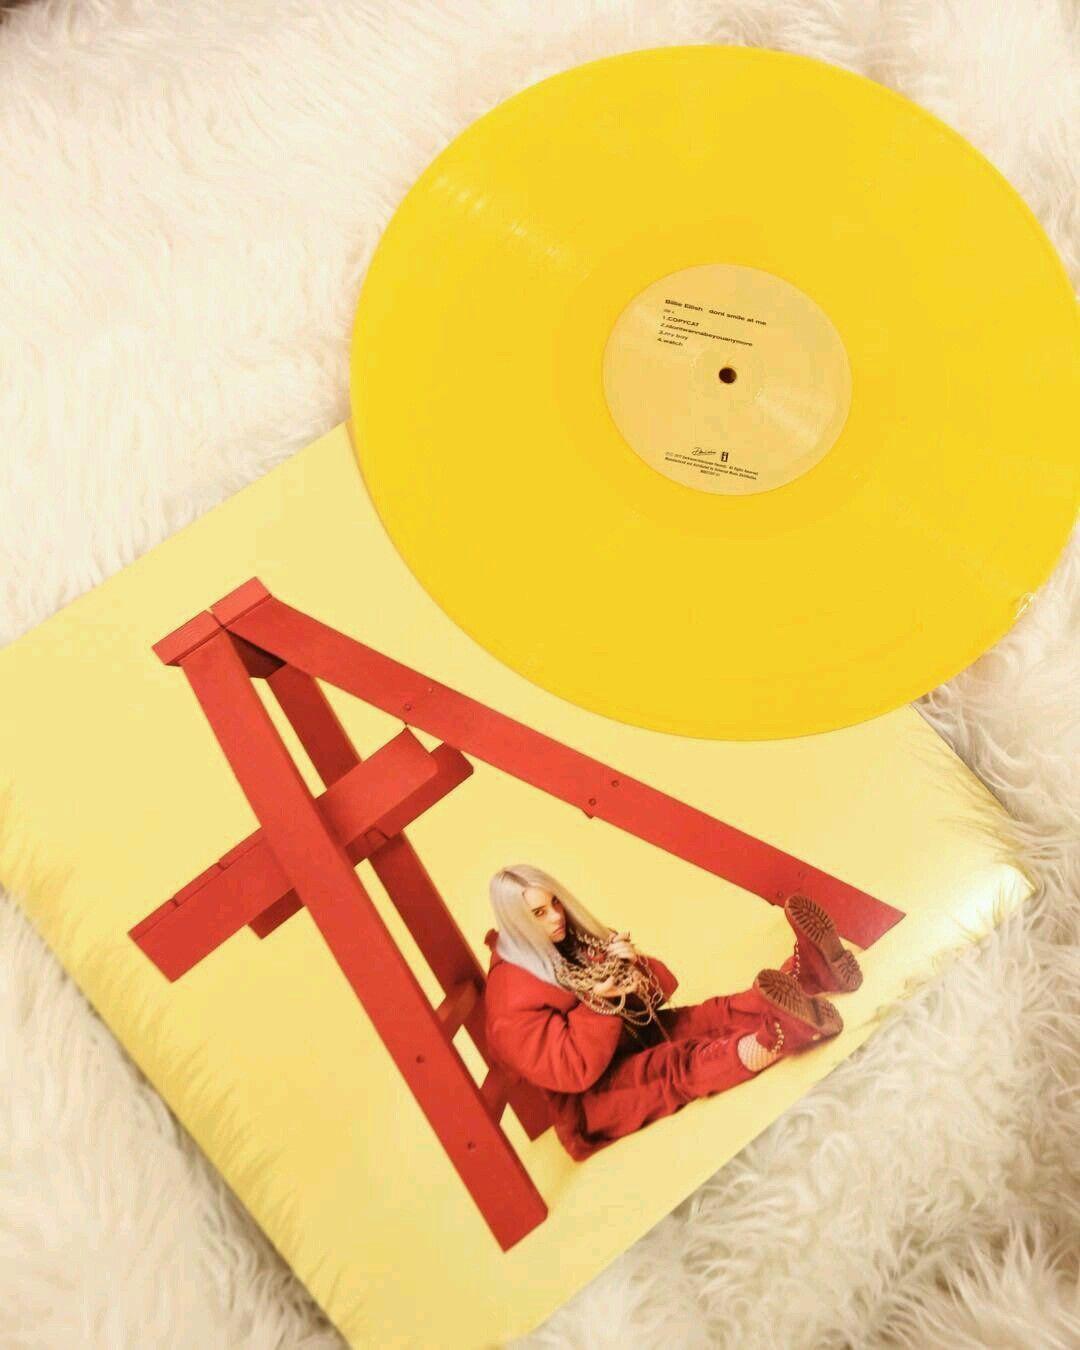 Pinterest Skylarmckellar Insta Sky Mckellar I Always Follow Back Vinyl Music Billie Eilish Christmas Wishlist 2018